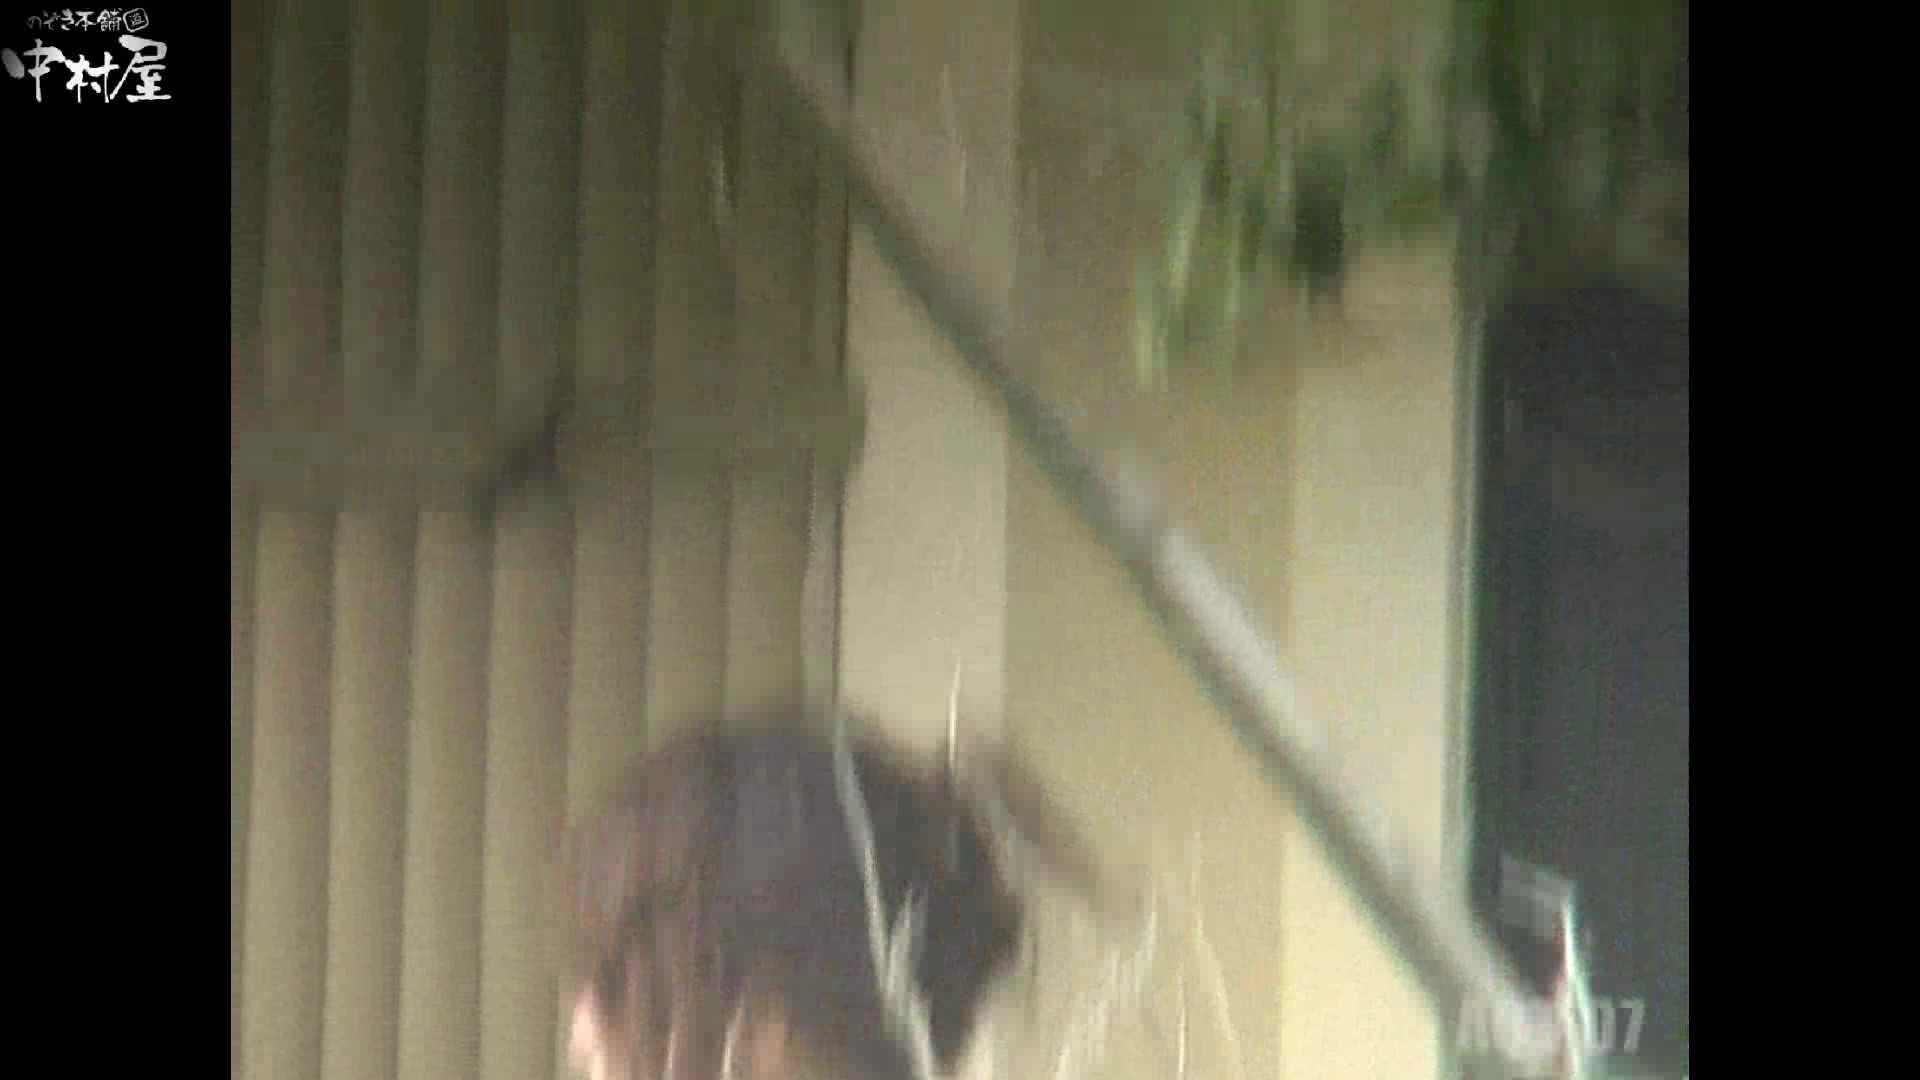 Aquaな露天風呂Vol.871潜入盗撮露天風呂七判湯 其の一 潜入 われめAV動画紹介 87PIX 71